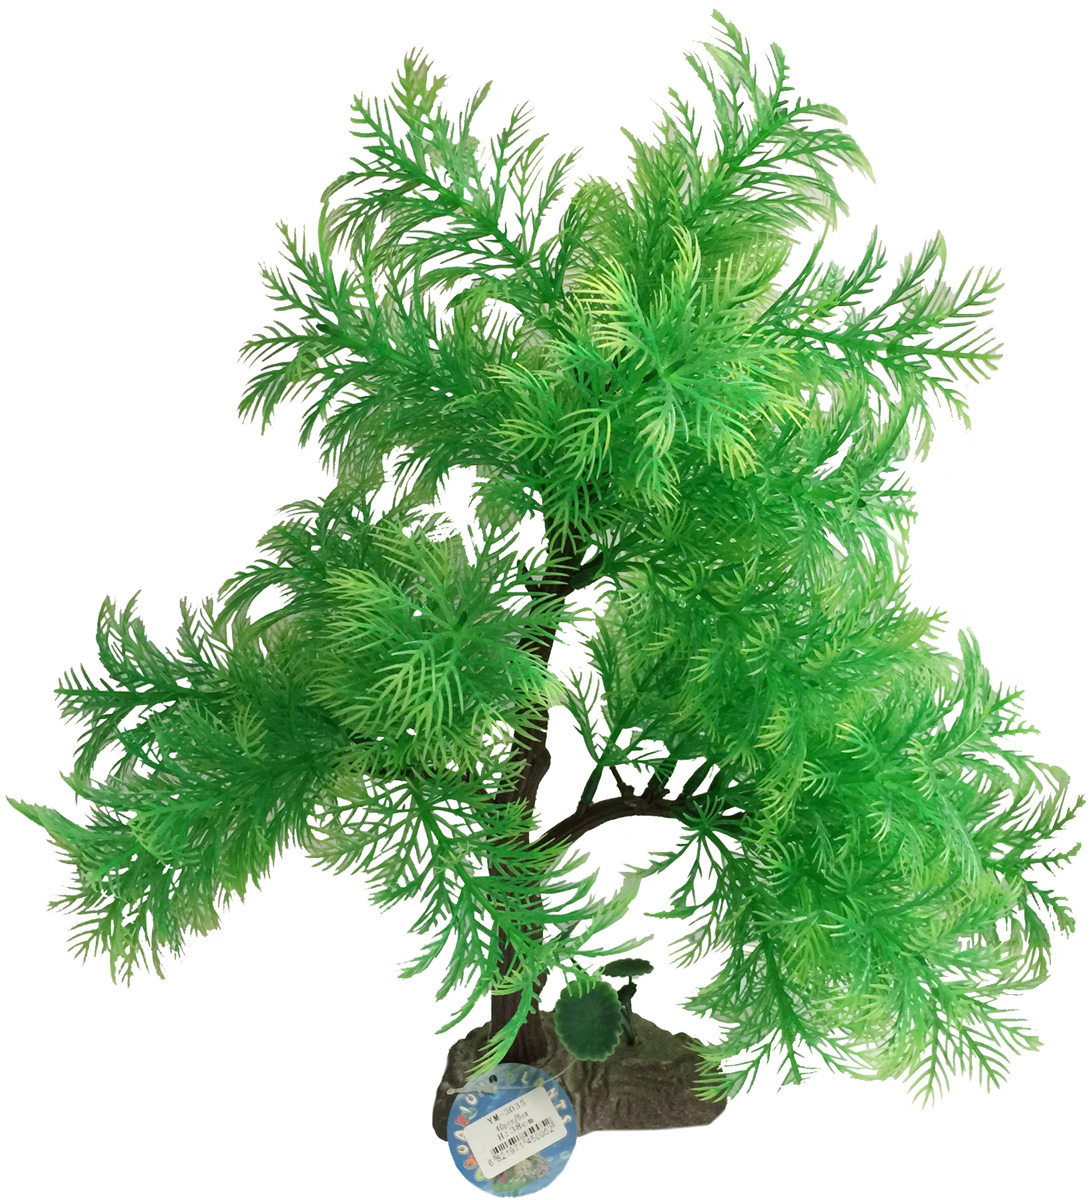 Грот Meijing Aquarium Дерево бонсай, 35-38 см. YM-3035YM-3035